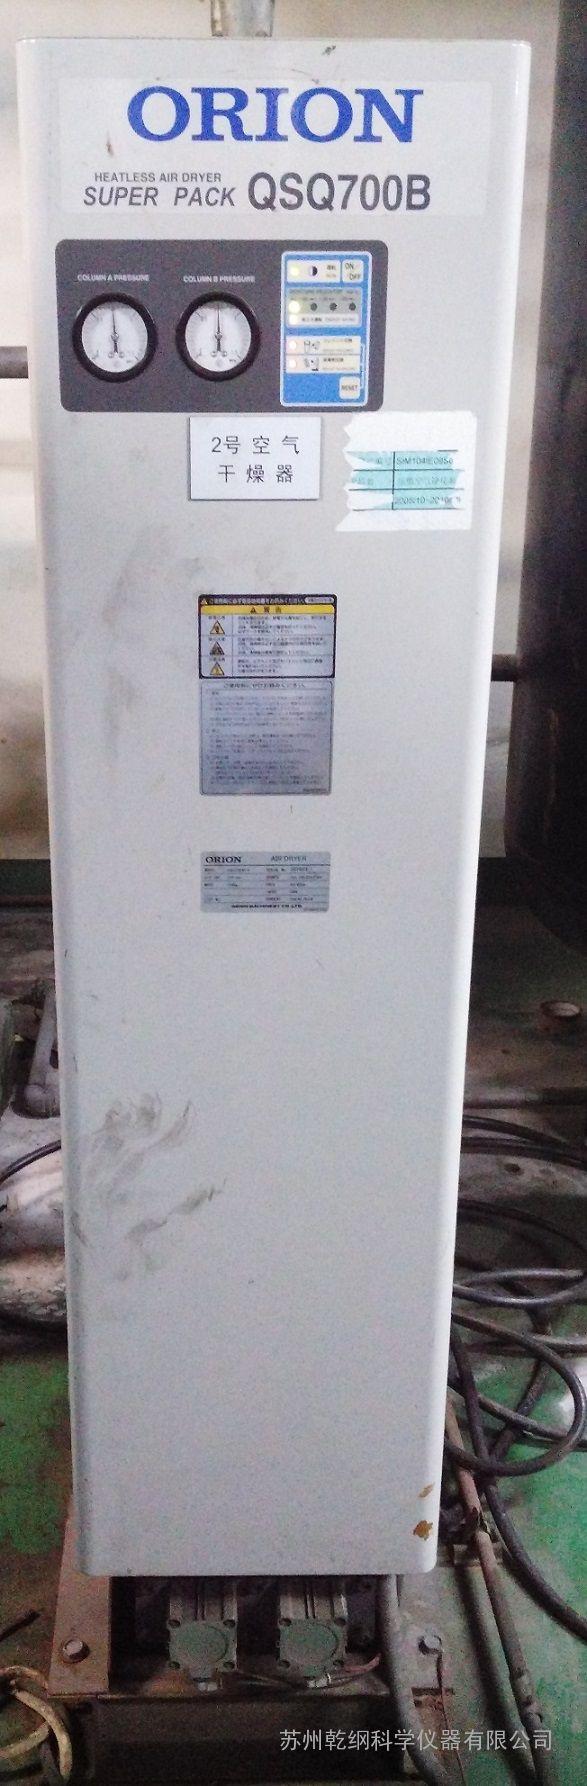 ORION好利旺吸附式干燥机QSQ180B-E